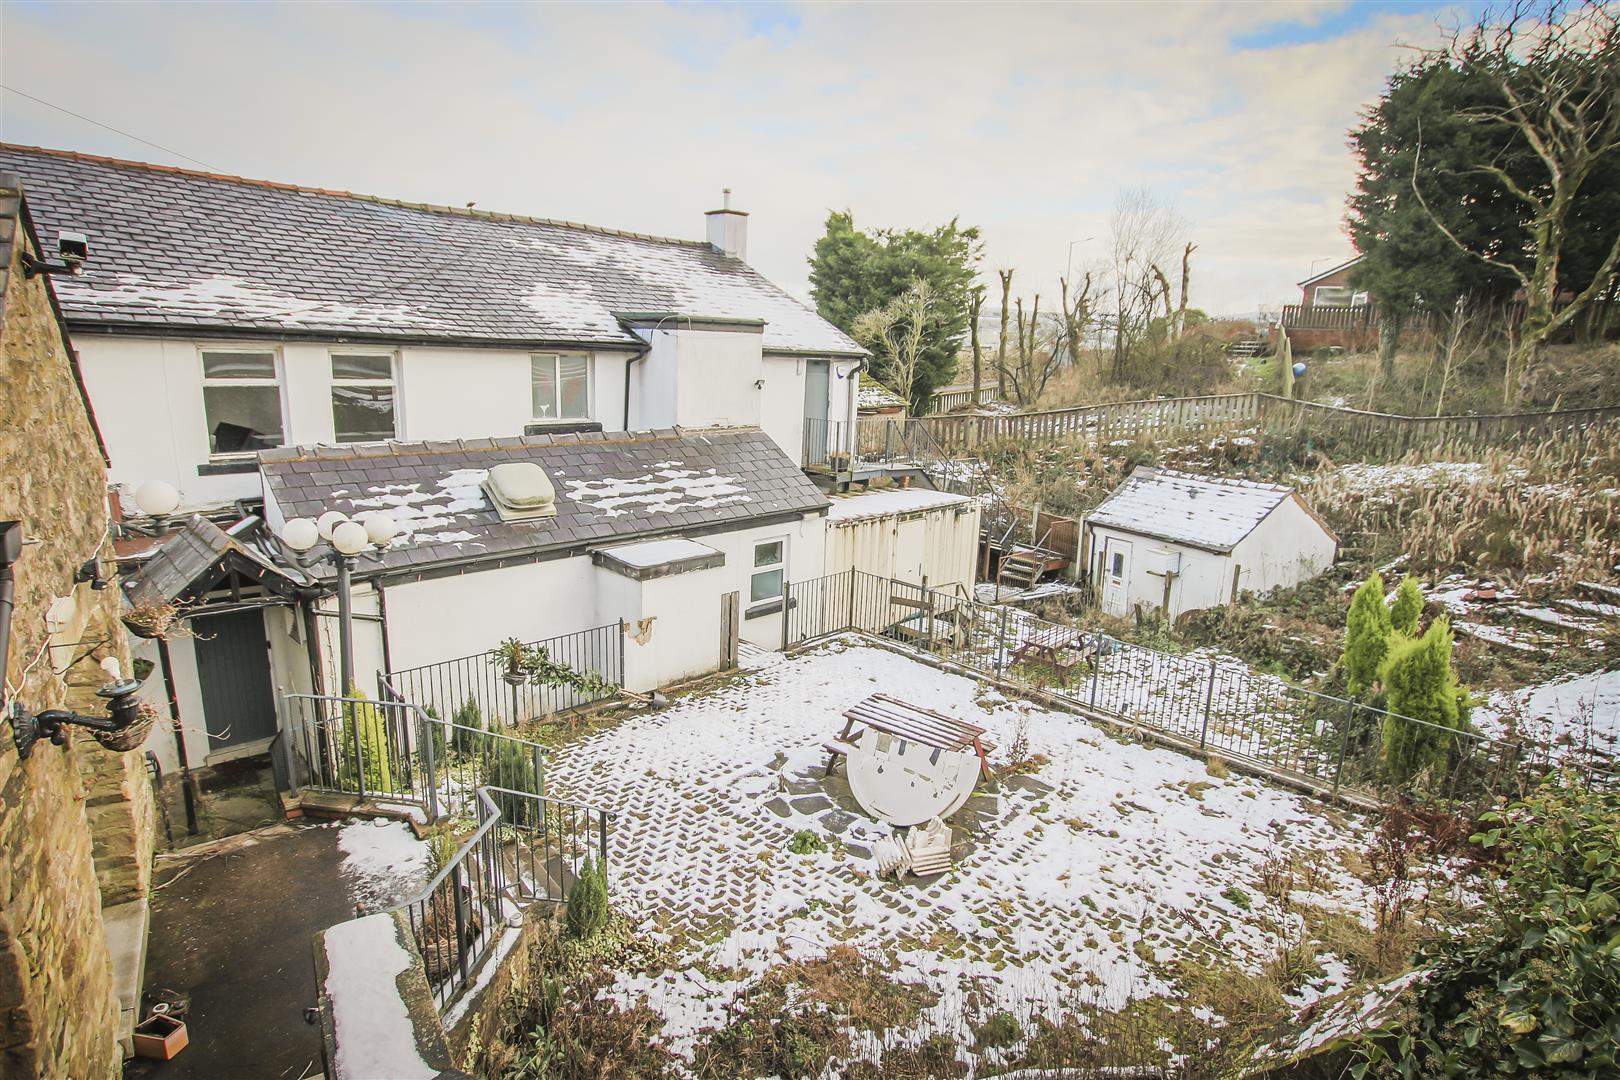 Development Site Land For Sale - Image 4